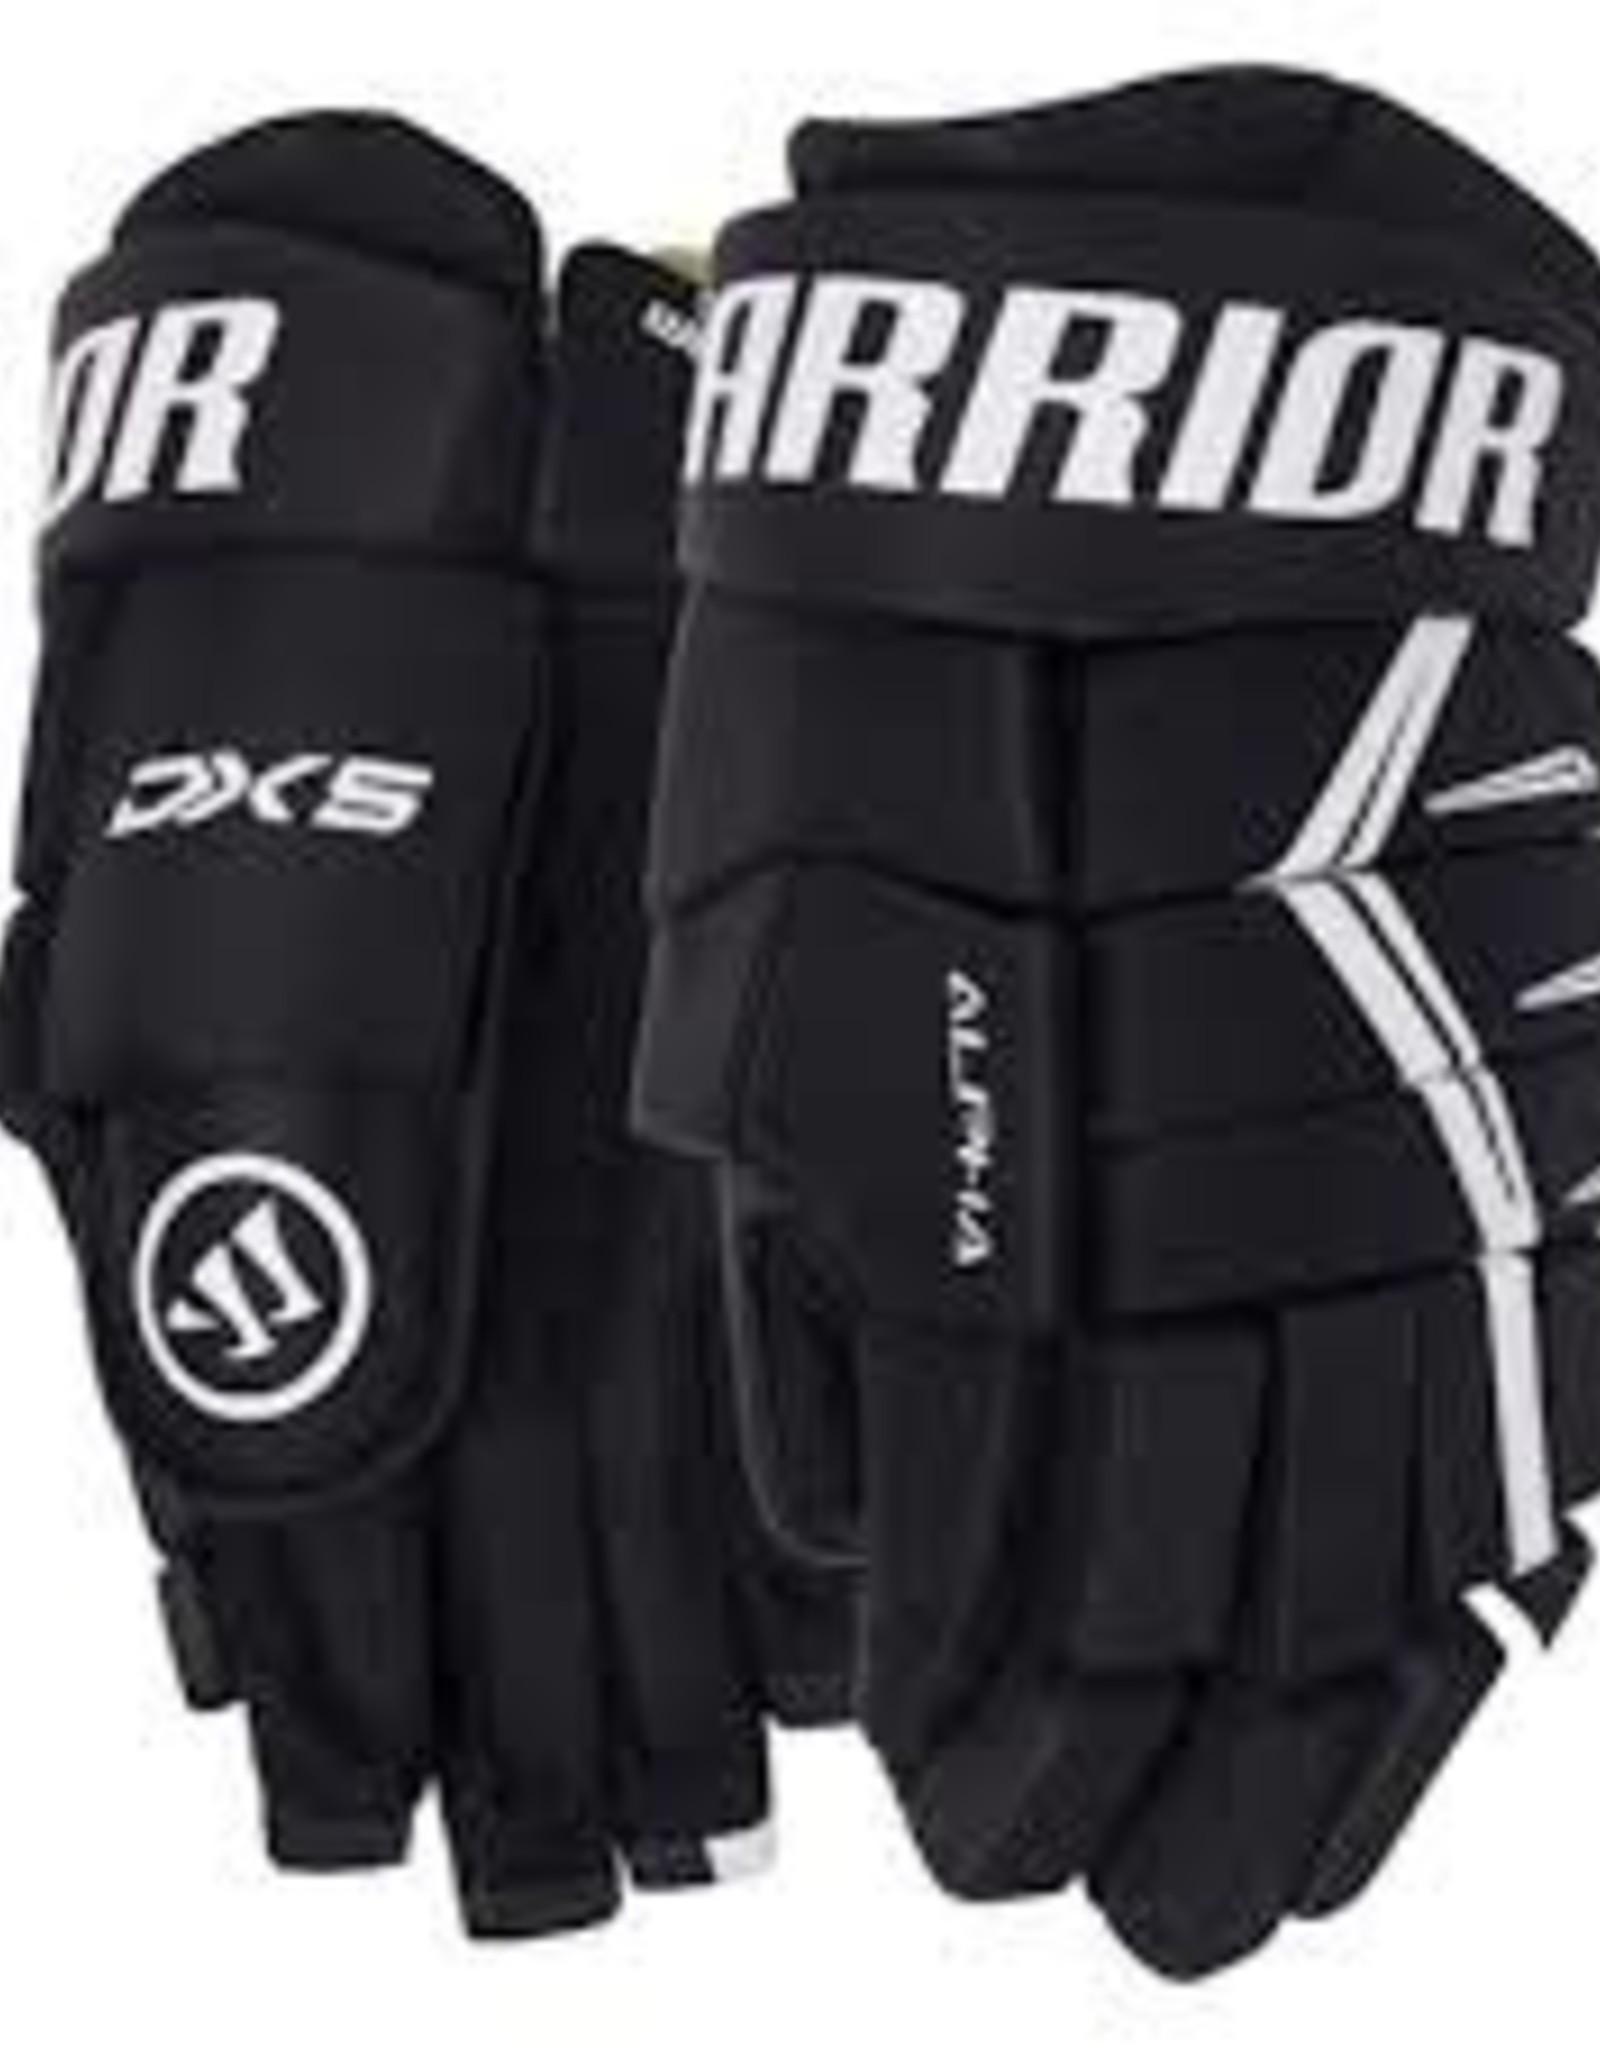 DX5 Senior Glove BK Black 15